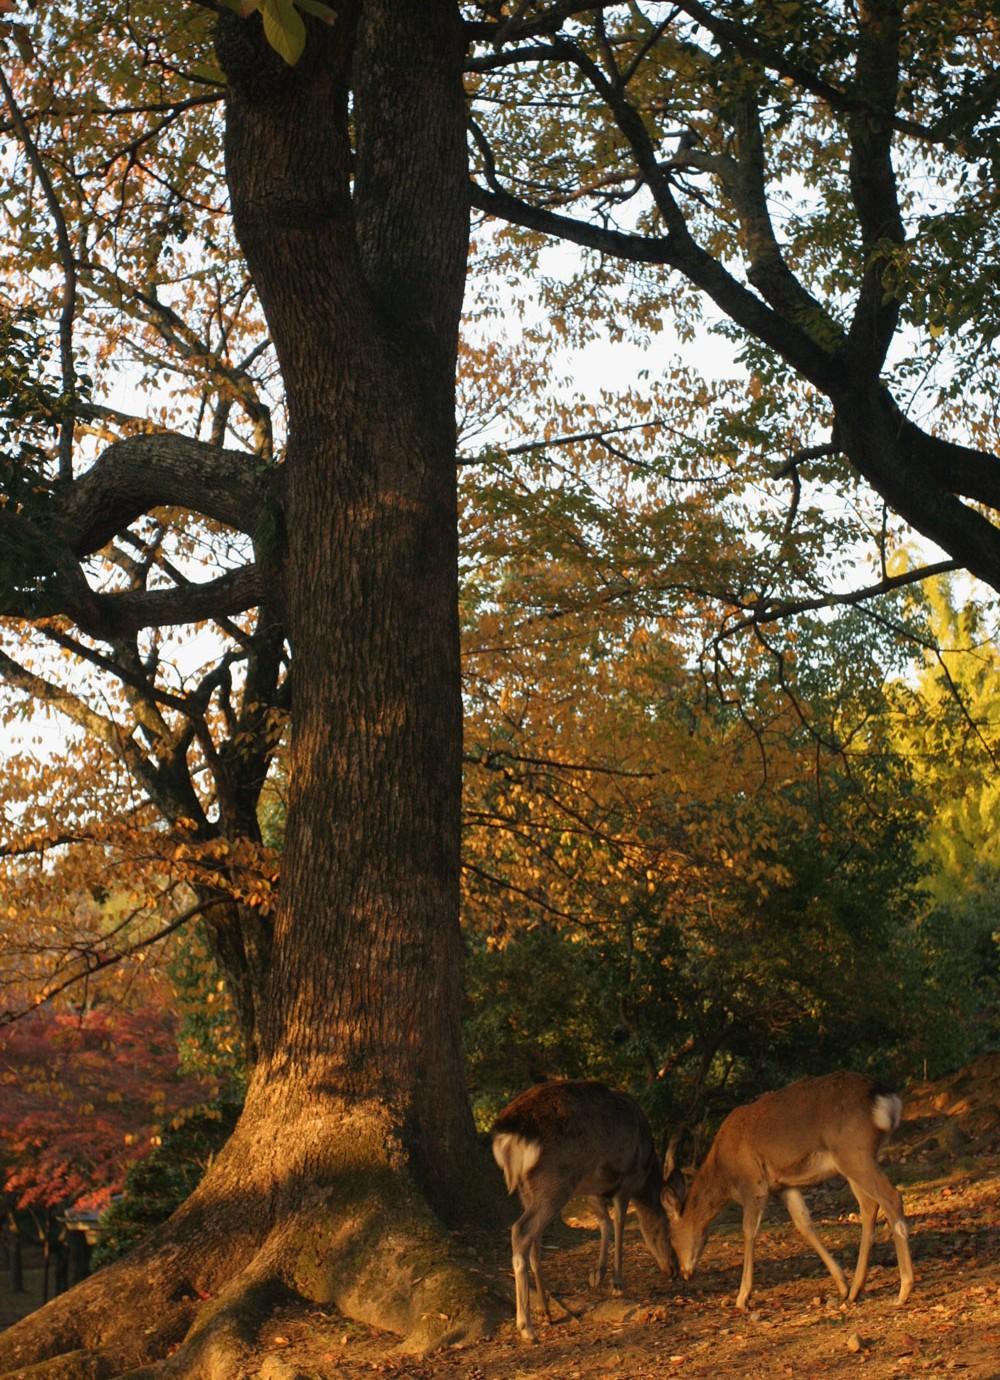 Dains du parc de Nara